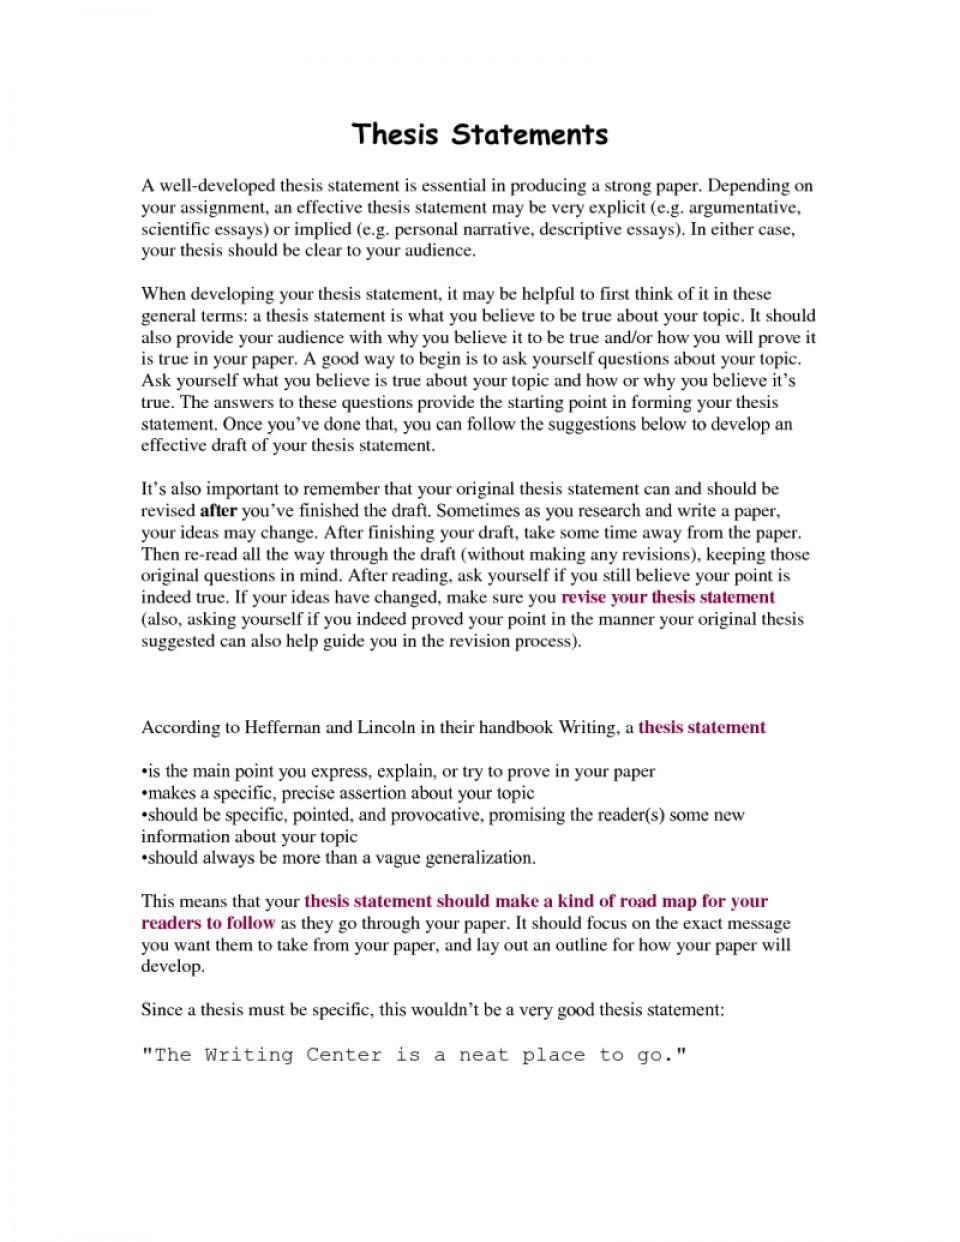 College essays standardized testing